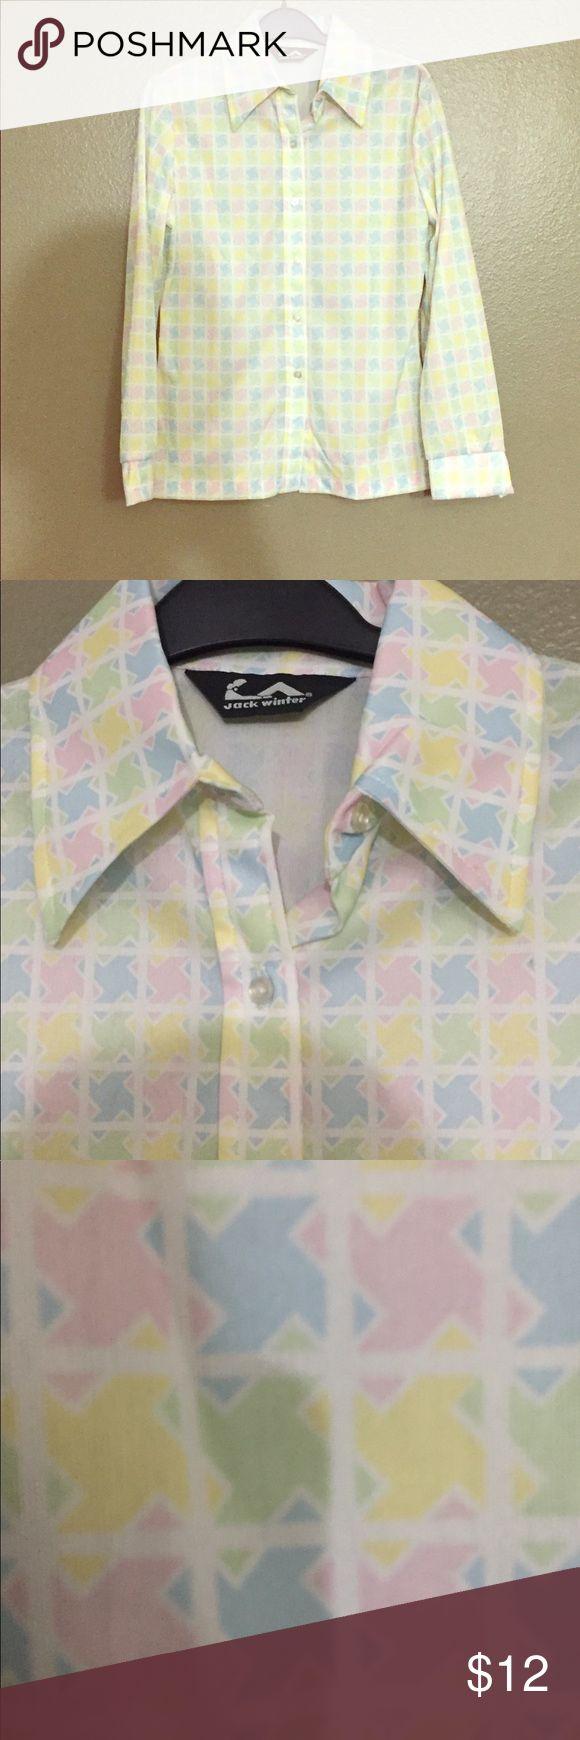 Vintage 70s Pastel Print Jack Winter Button-Up S Vintage 70s Pastel Pink Blue Green  Print Jack Winter Button-Up Shirt. Then Sz 12 Now S. Good vintage condition. Jack Winter Tops Button Down Shirts